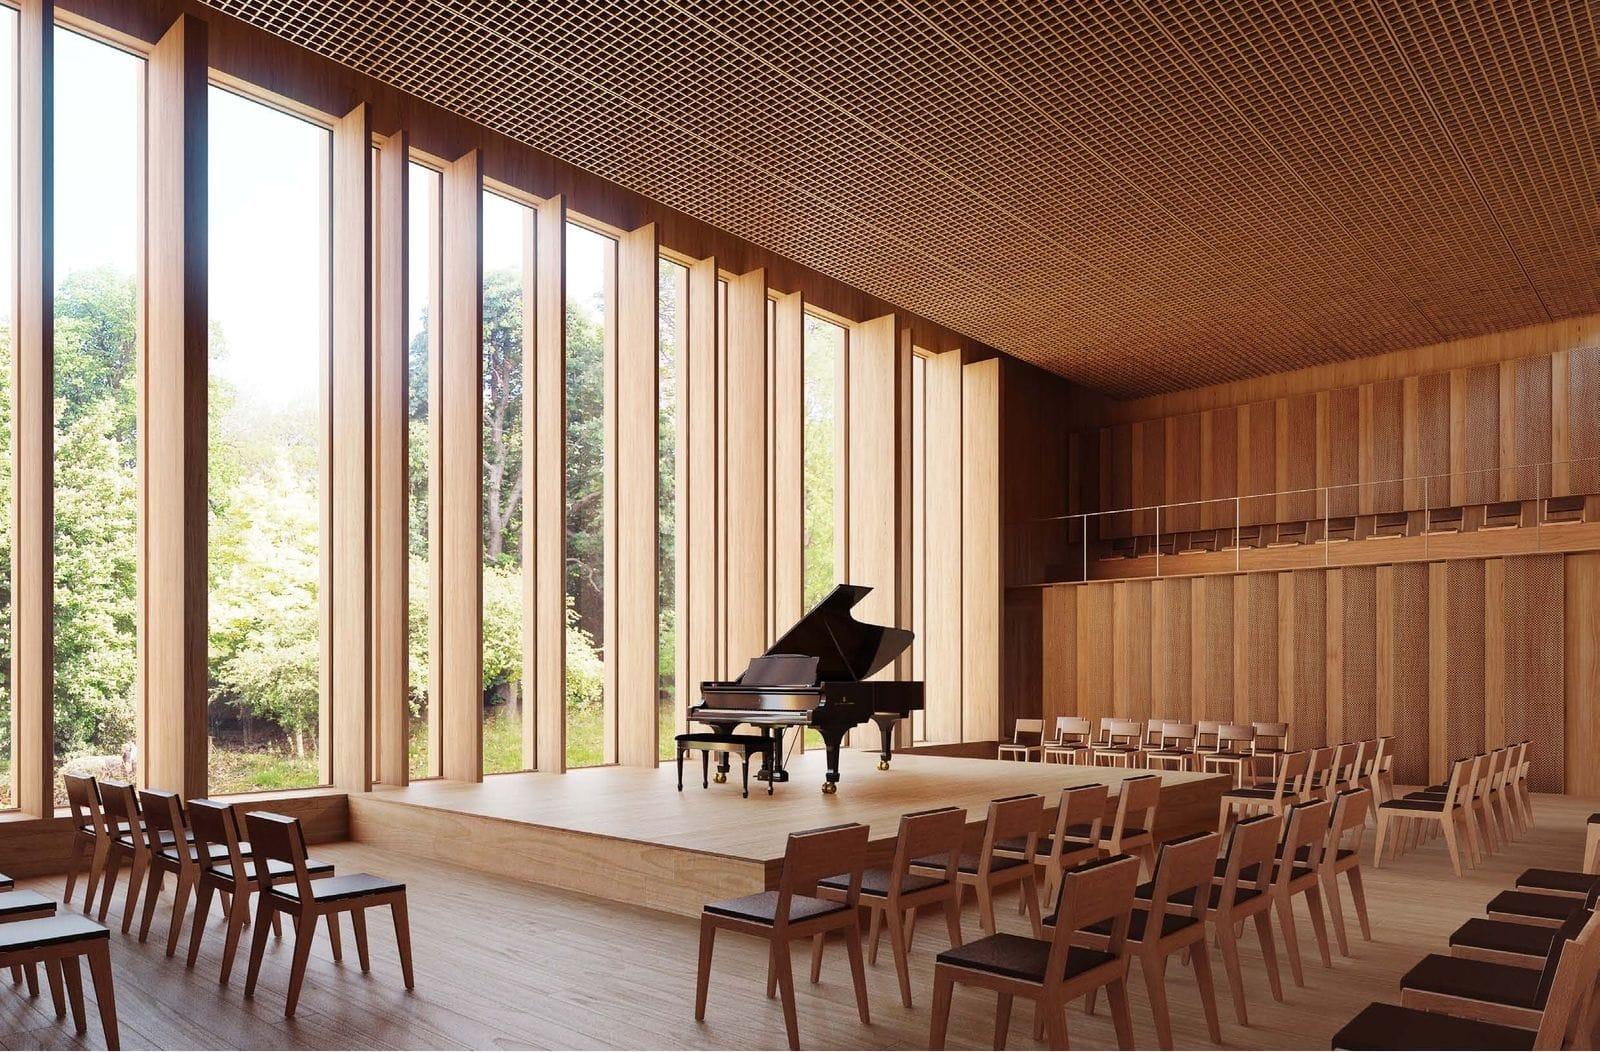 bureau greisch chapelle musicale reine elisabeth. Black Bedroom Furniture Sets. Home Design Ideas